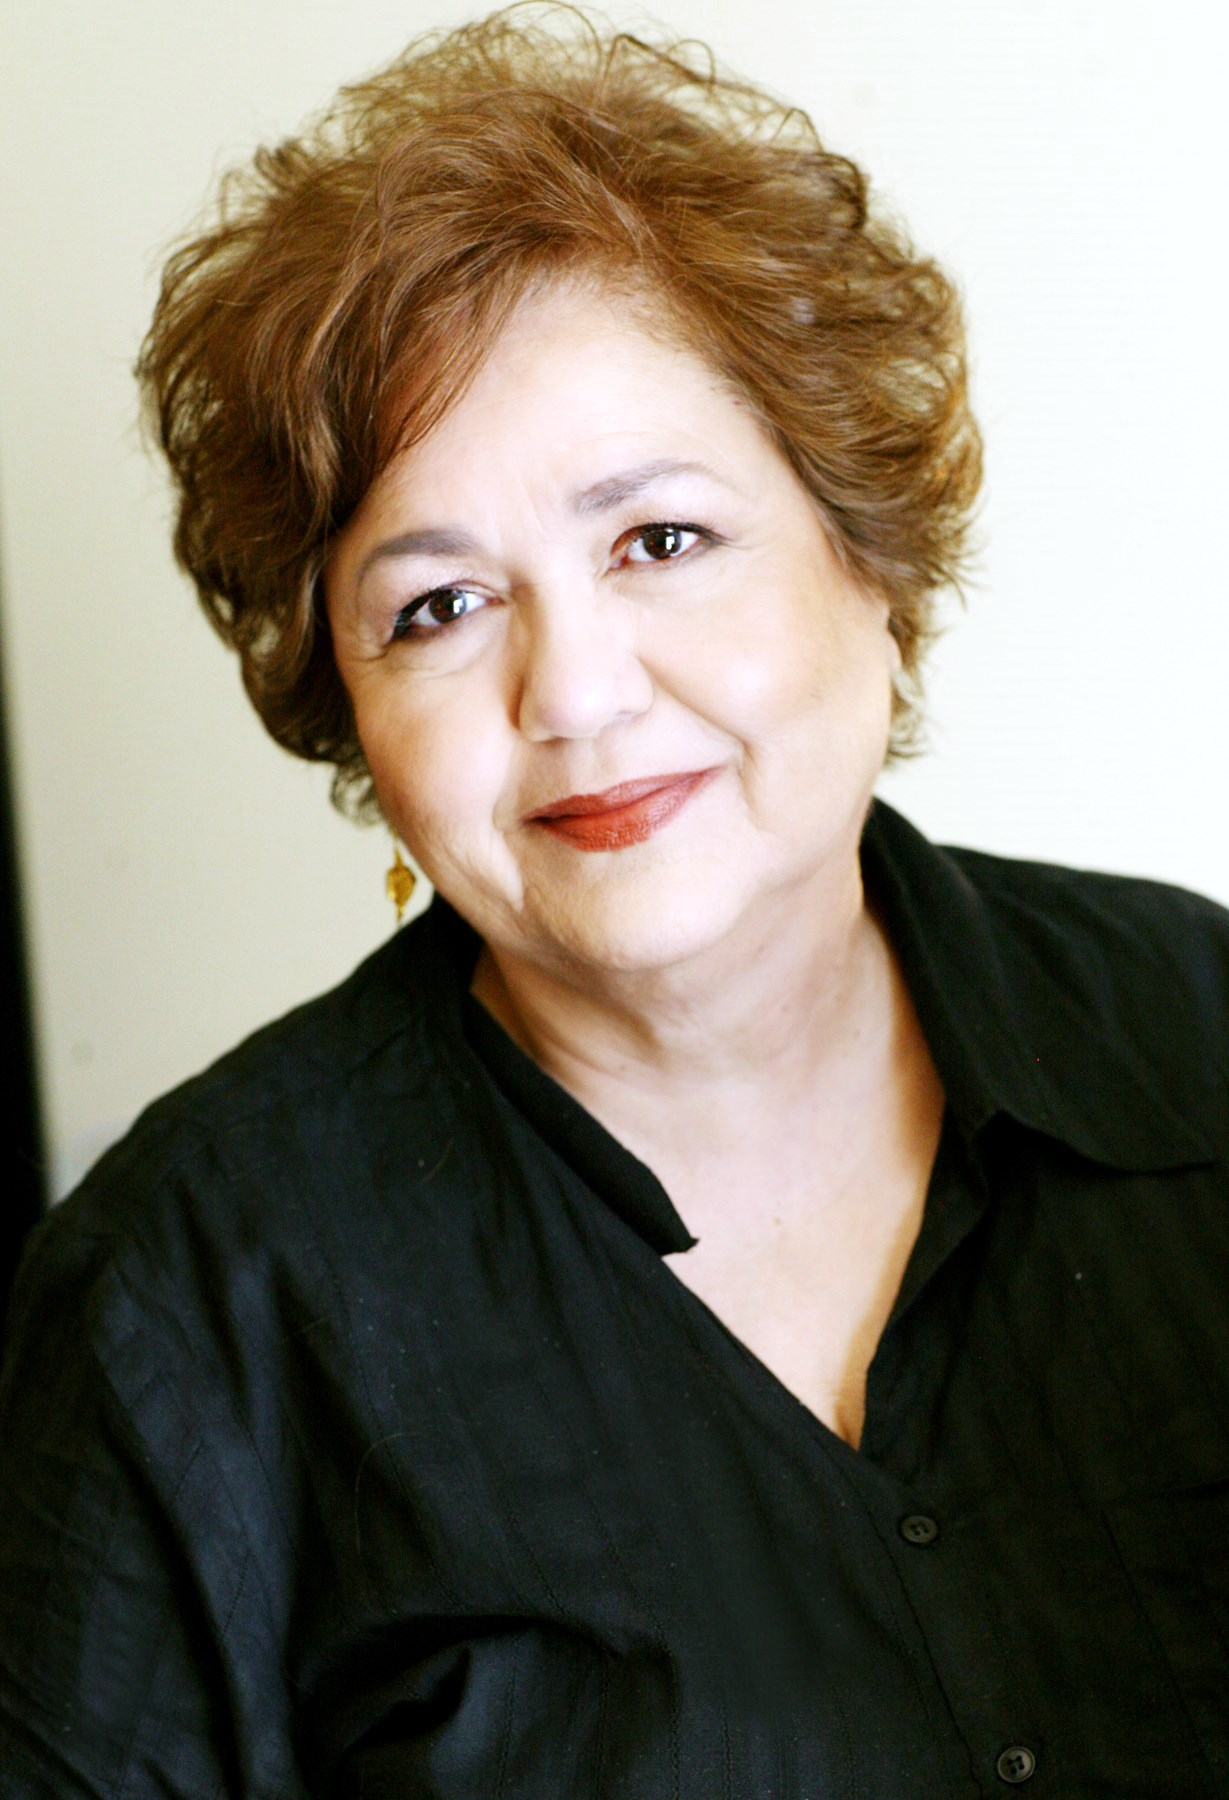 Sonia J Alvarez Was Born On April   In San Antonio Texas And Passed Away On February   In San Antonio Texas